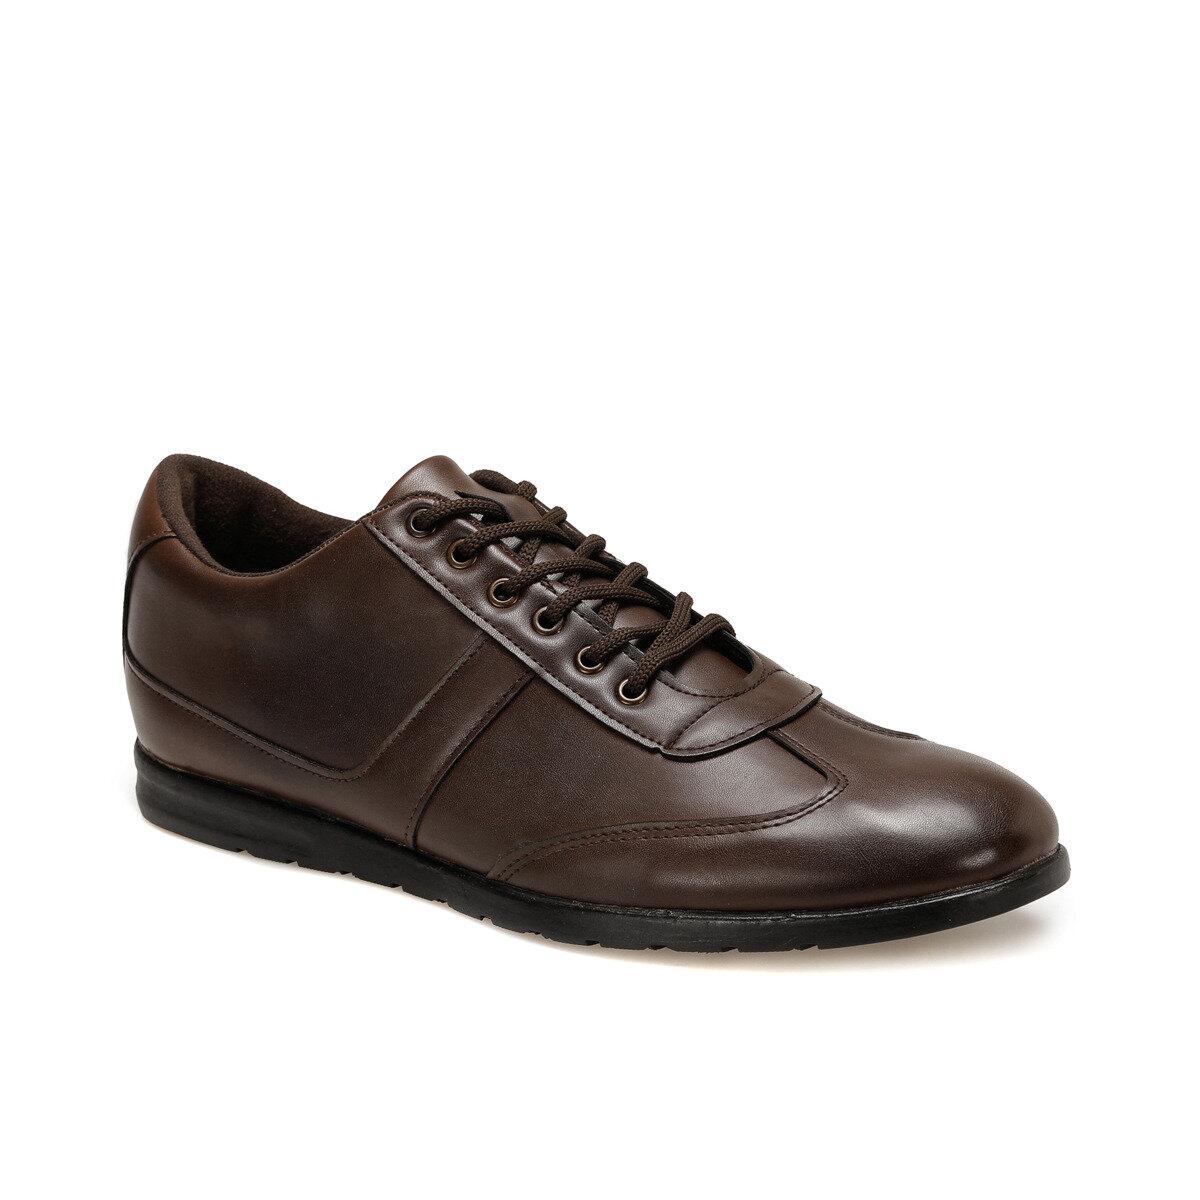 FLO GBS118 براون حذاء رجالي غير رسمي أوكسيد